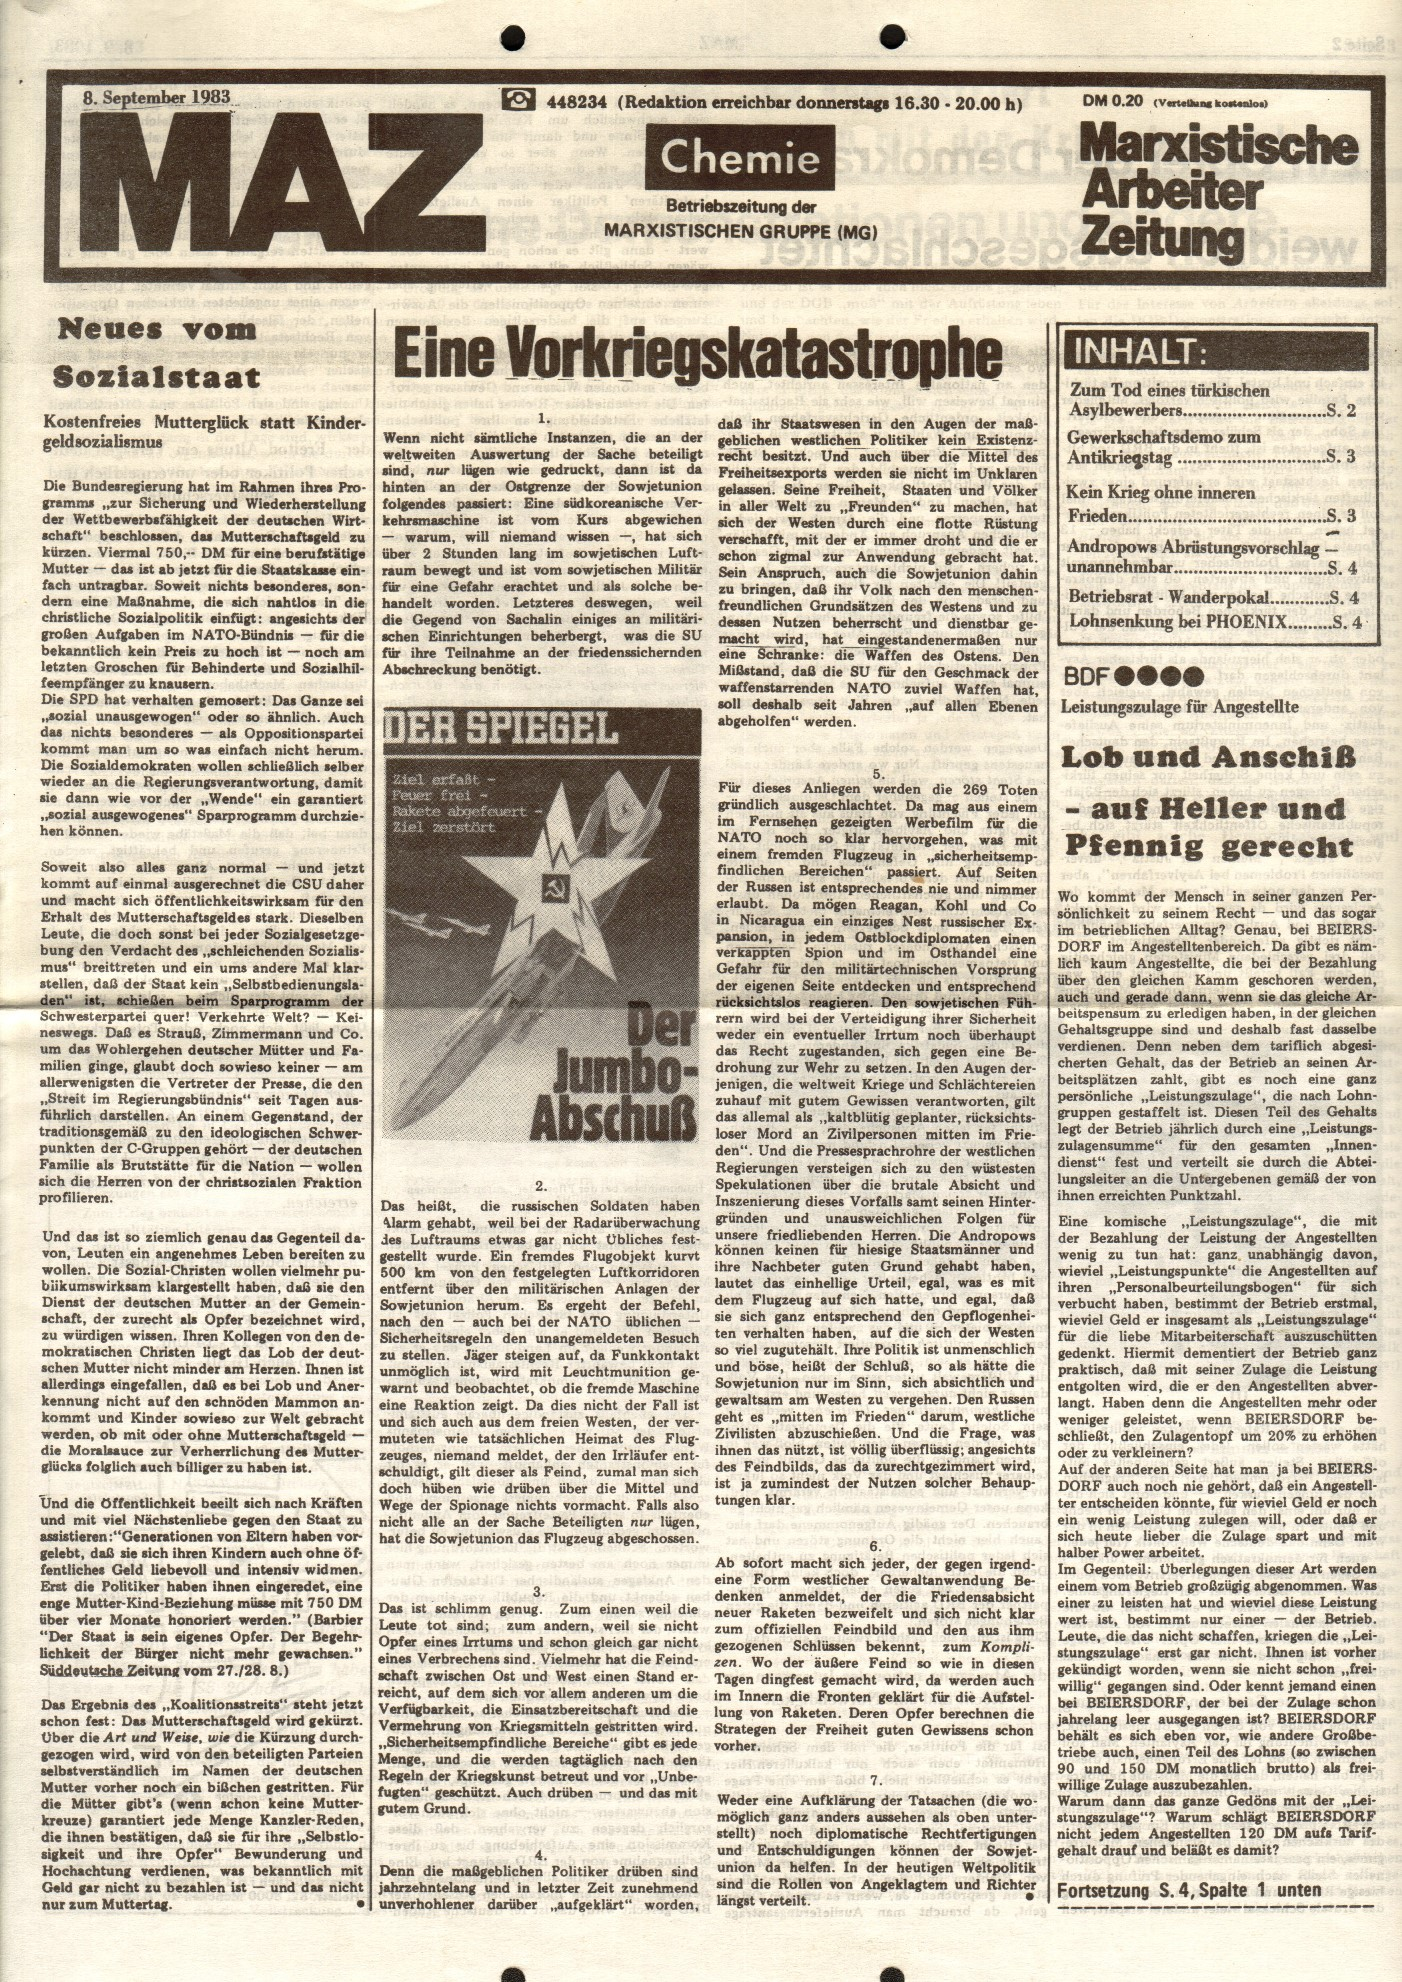 Hamburg_MG_MAZ_Chemie_19830908_01